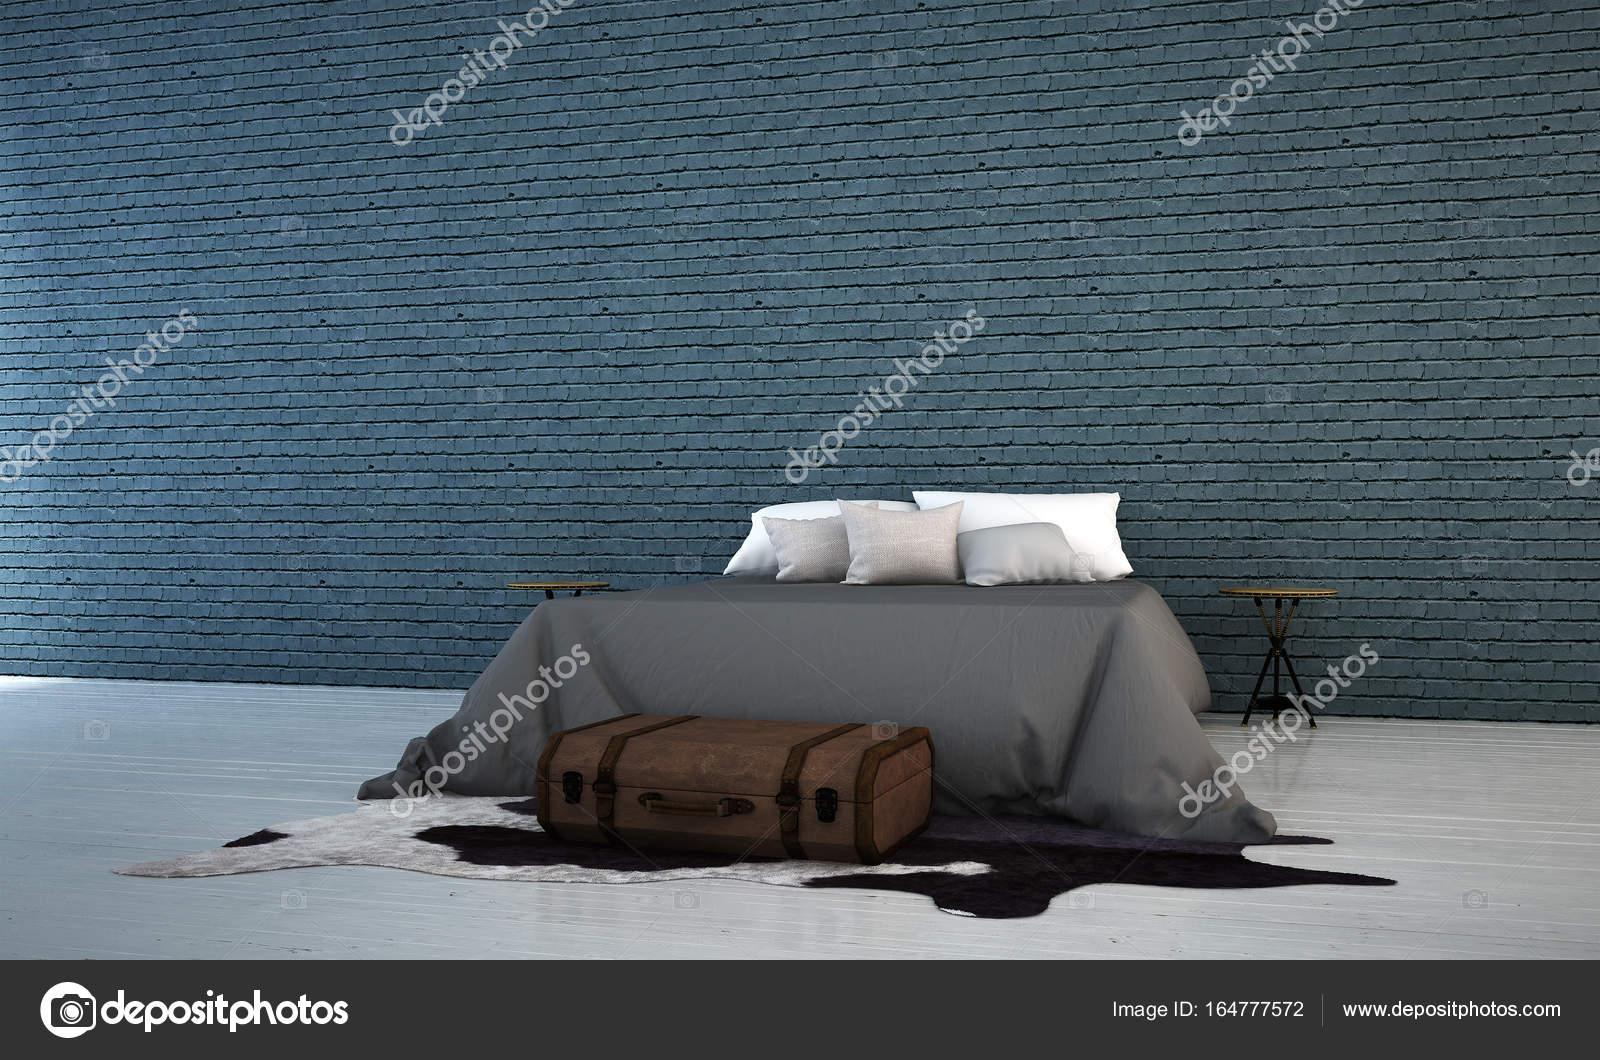 Interieur Ice Blauw : De slaapkamer interieur en blauw bakstenen muur achtergrond